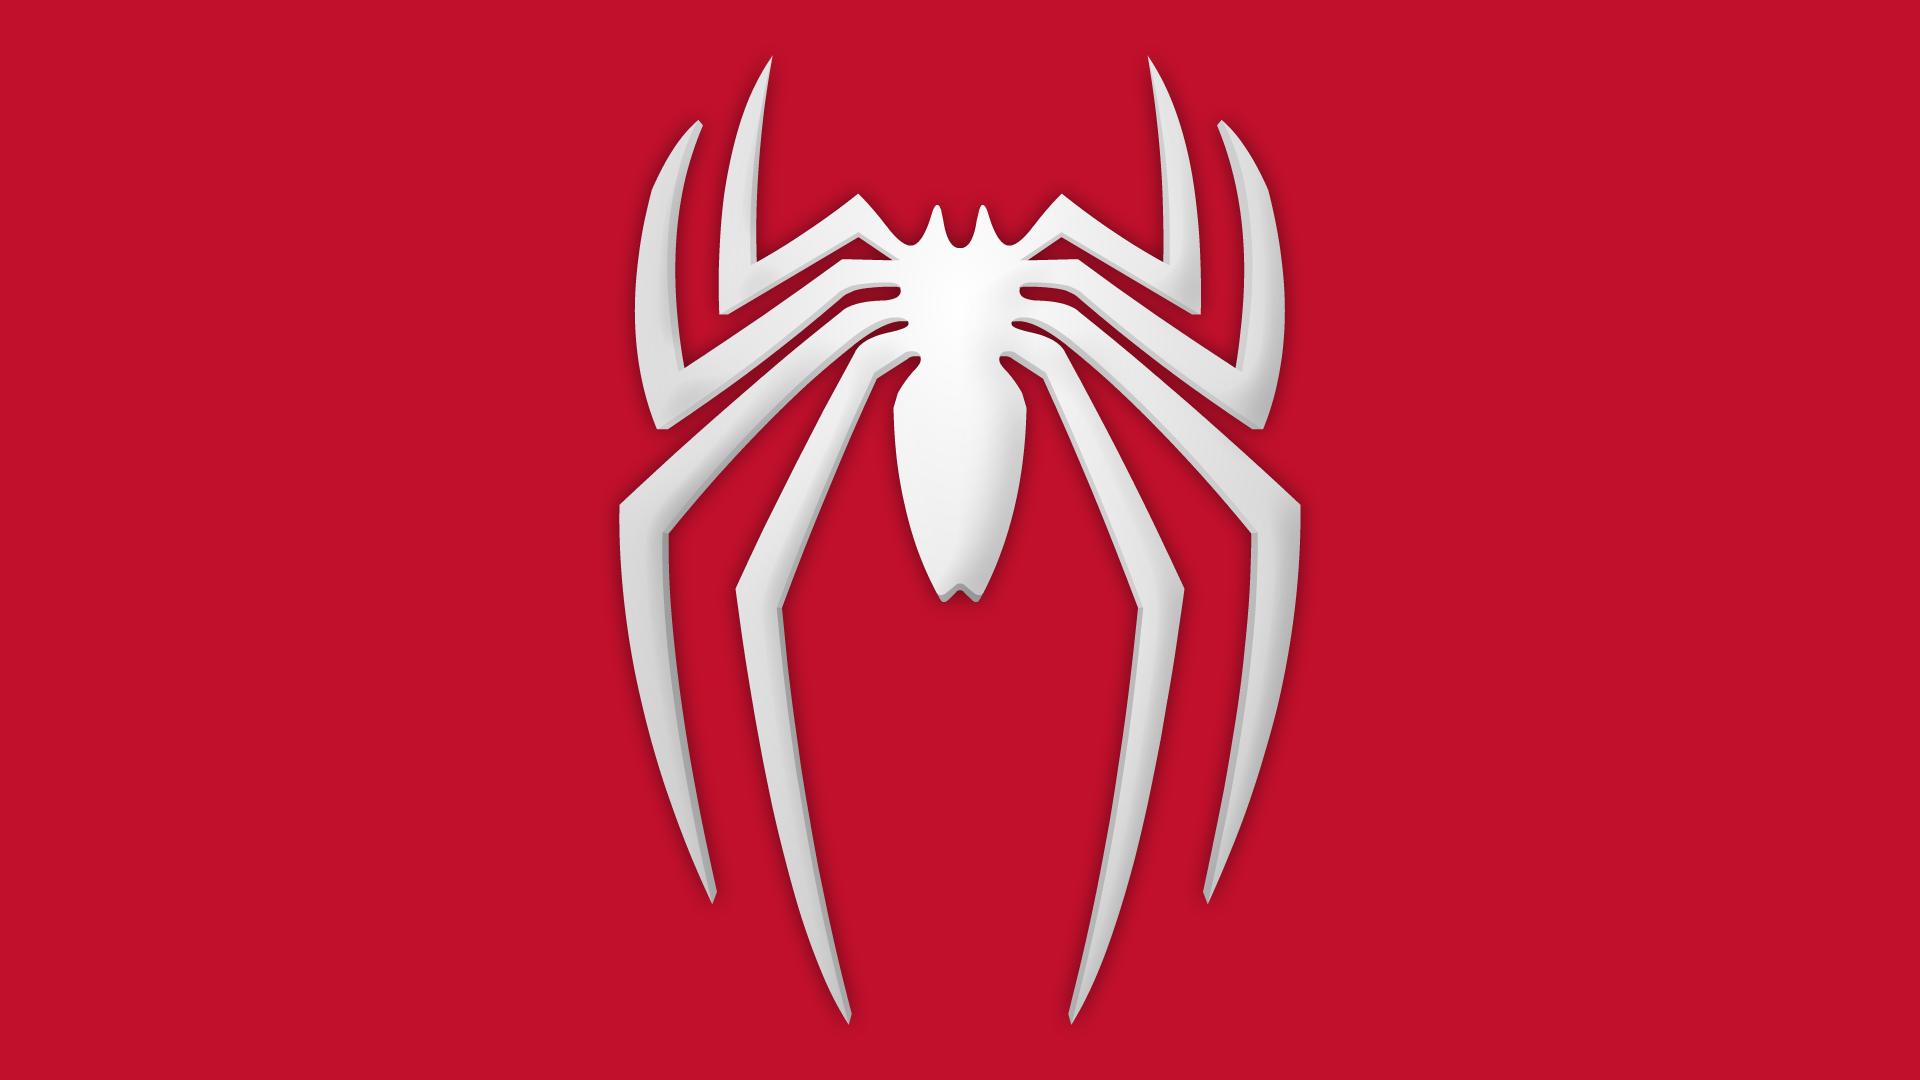 Spider man homecoming poster 3 by bakikayaa on deviantart spider man ps4 symbol by yurtigo biocorpaavc